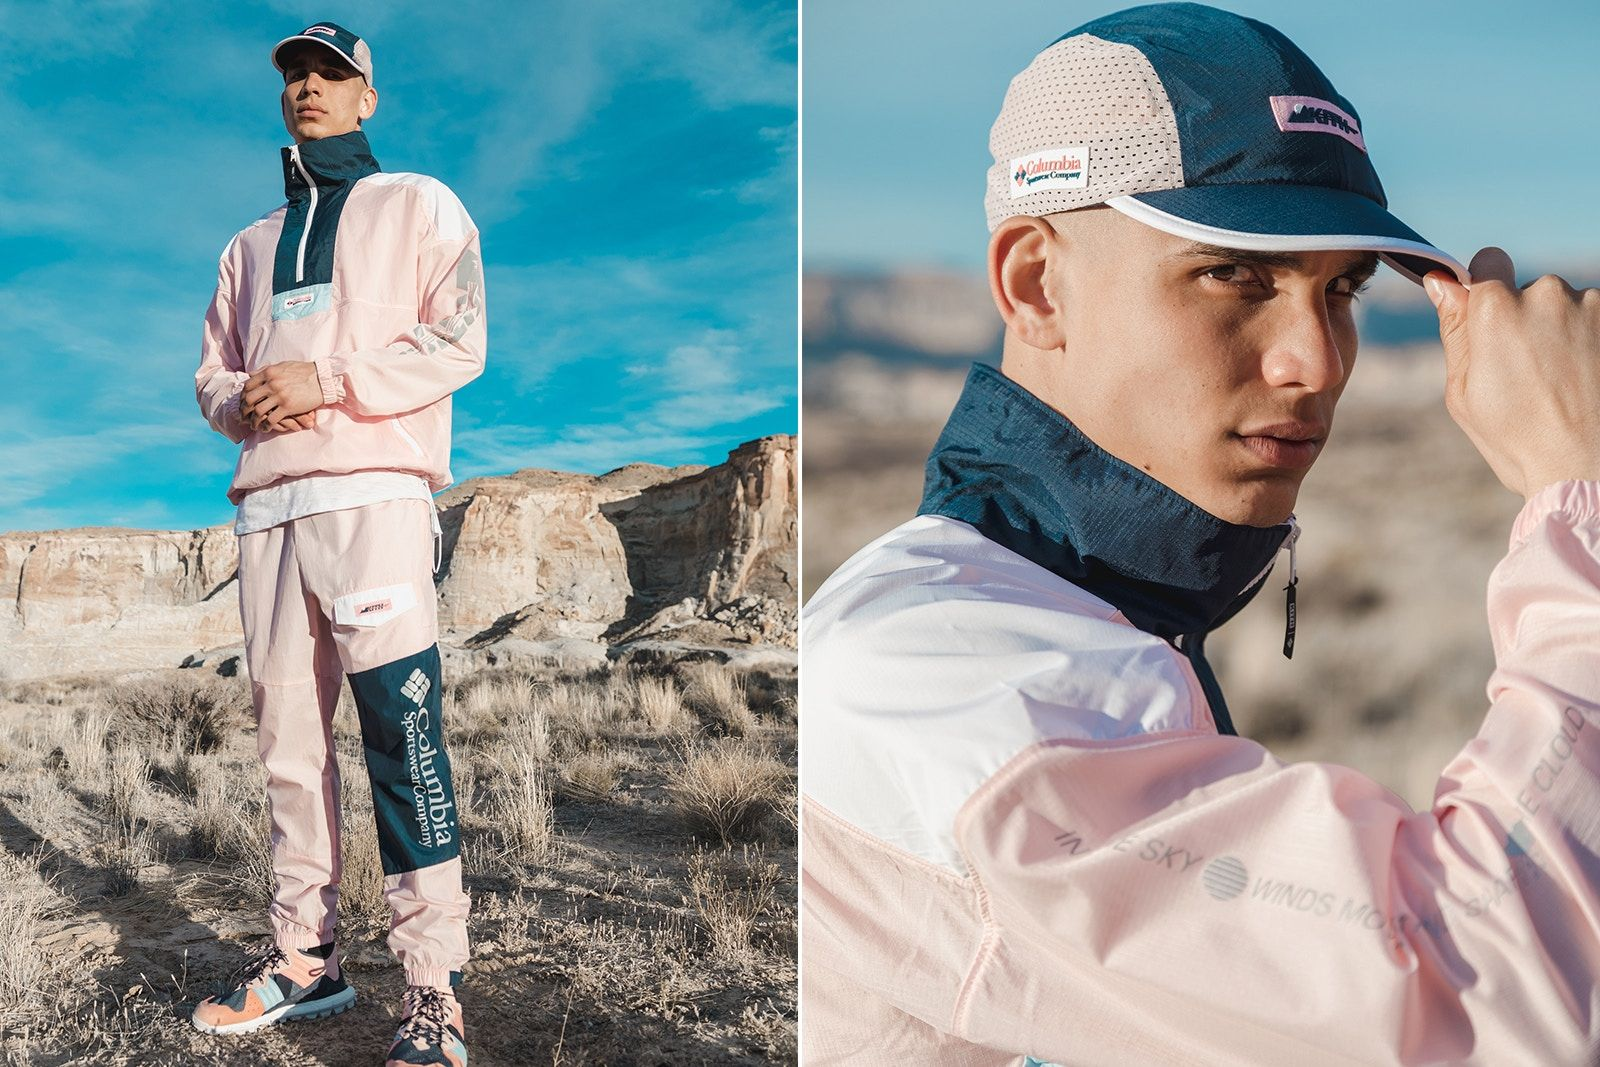 45263206e6 KITH Utah Collection EEA Element Exploration Agency fashion footwear  accessories 2018 Columbia Sportswear adidas TUMI Oakley G Shock Ronnie Fieg  release ...